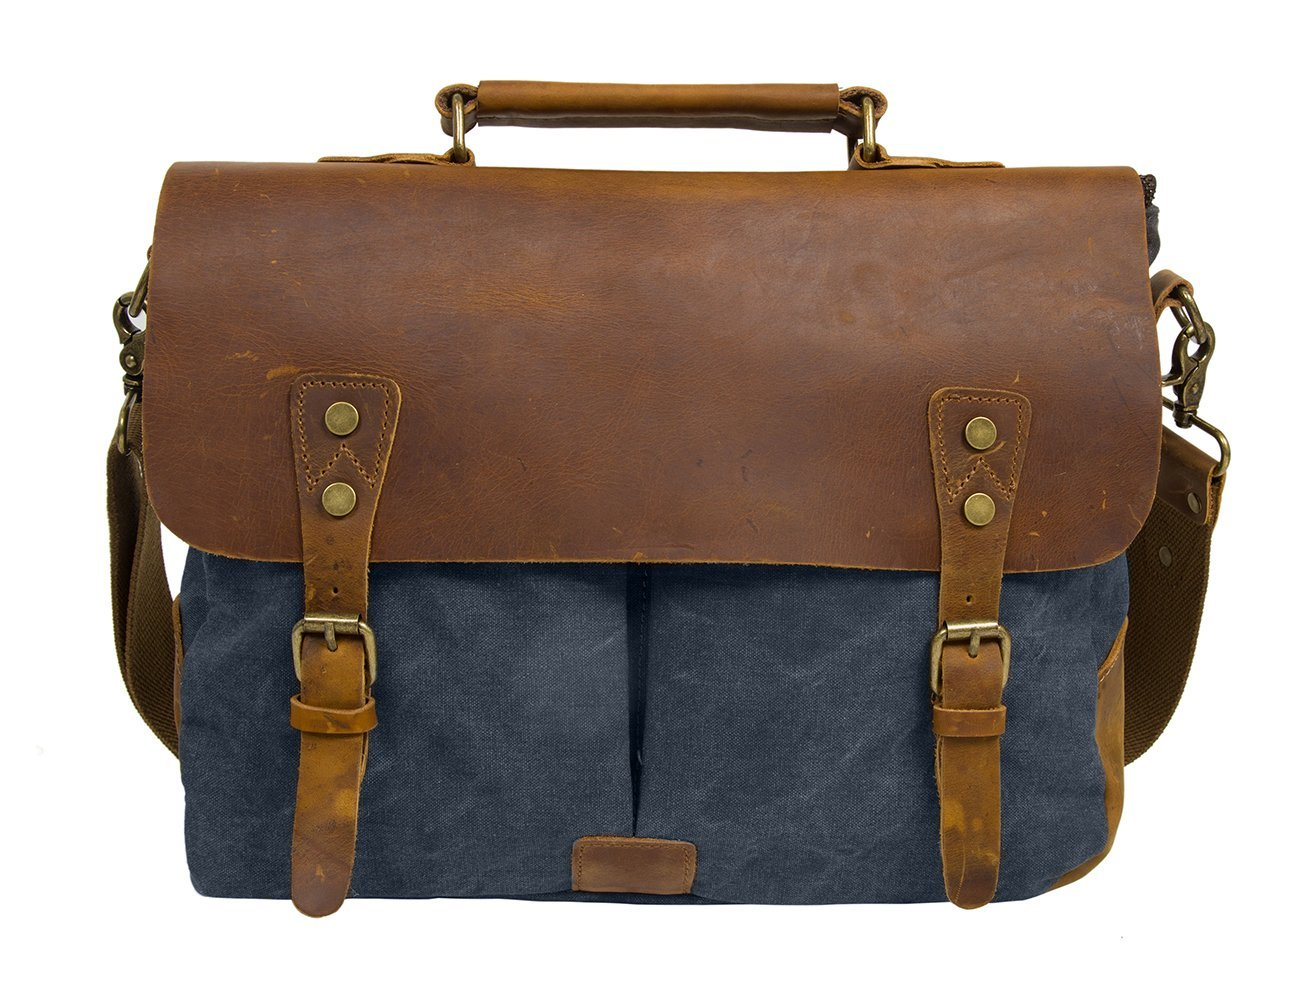 736d51c72 Amazon.com: ECOSUSI Unisex Vintage Canvas Leather 14